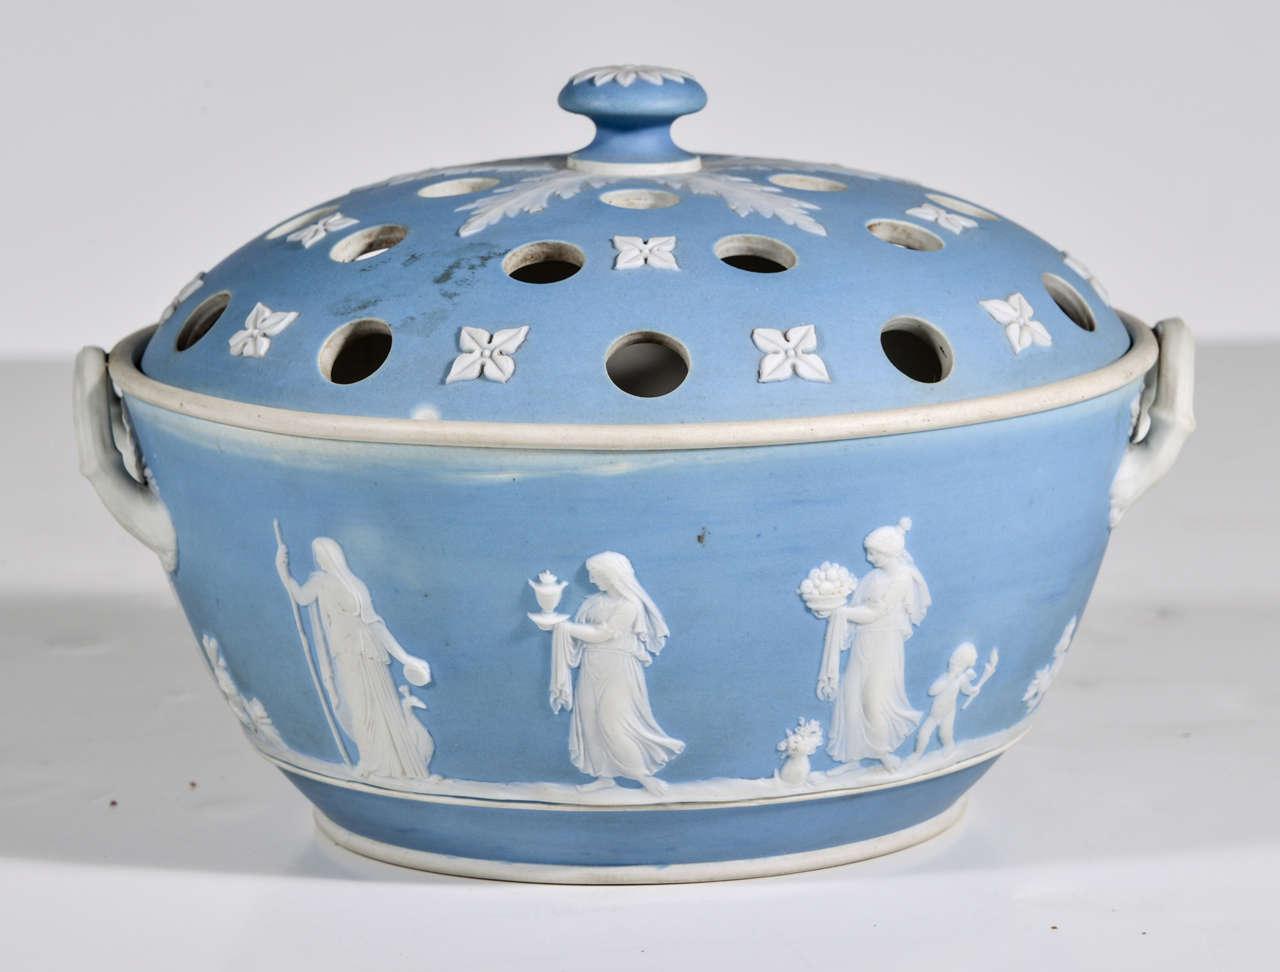 English Wedgwood blue-dip Jasperware stoneware covered potpourri bowl, circa 1900.  Impressed mark